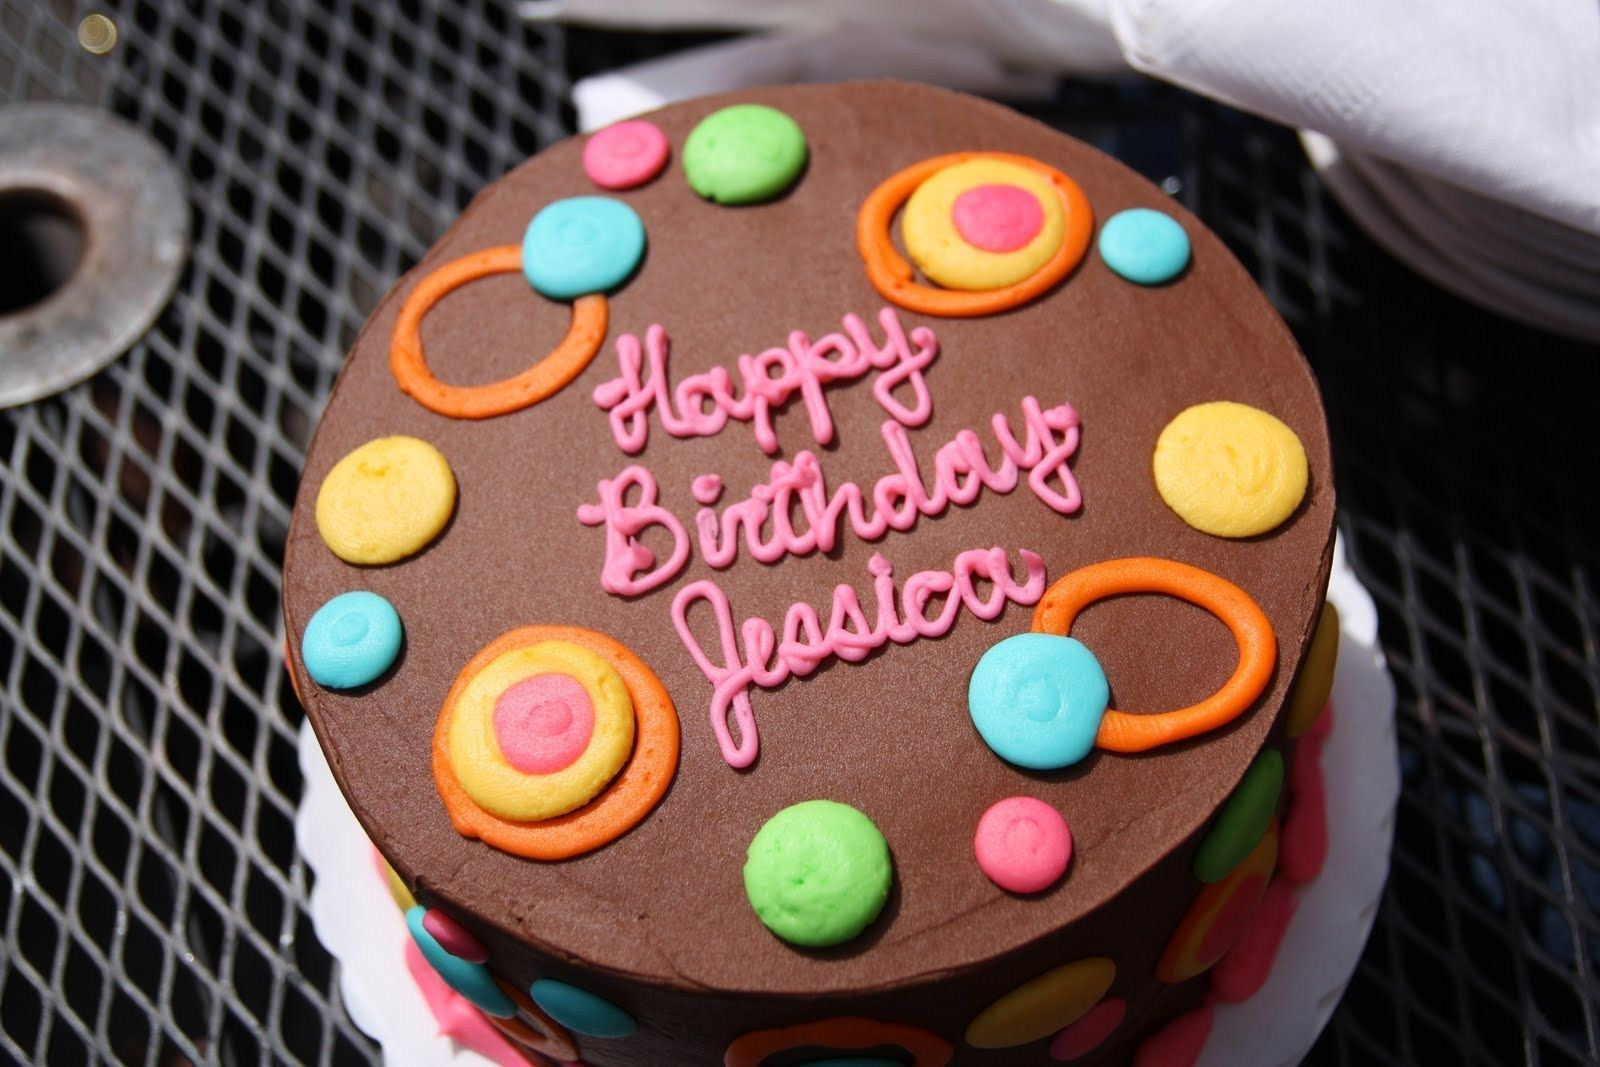 Astounding 27 Inspired Image Of Happy Birthday Jessica Cake Cake Birthday Funny Birthday Cards Online Alyptdamsfinfo